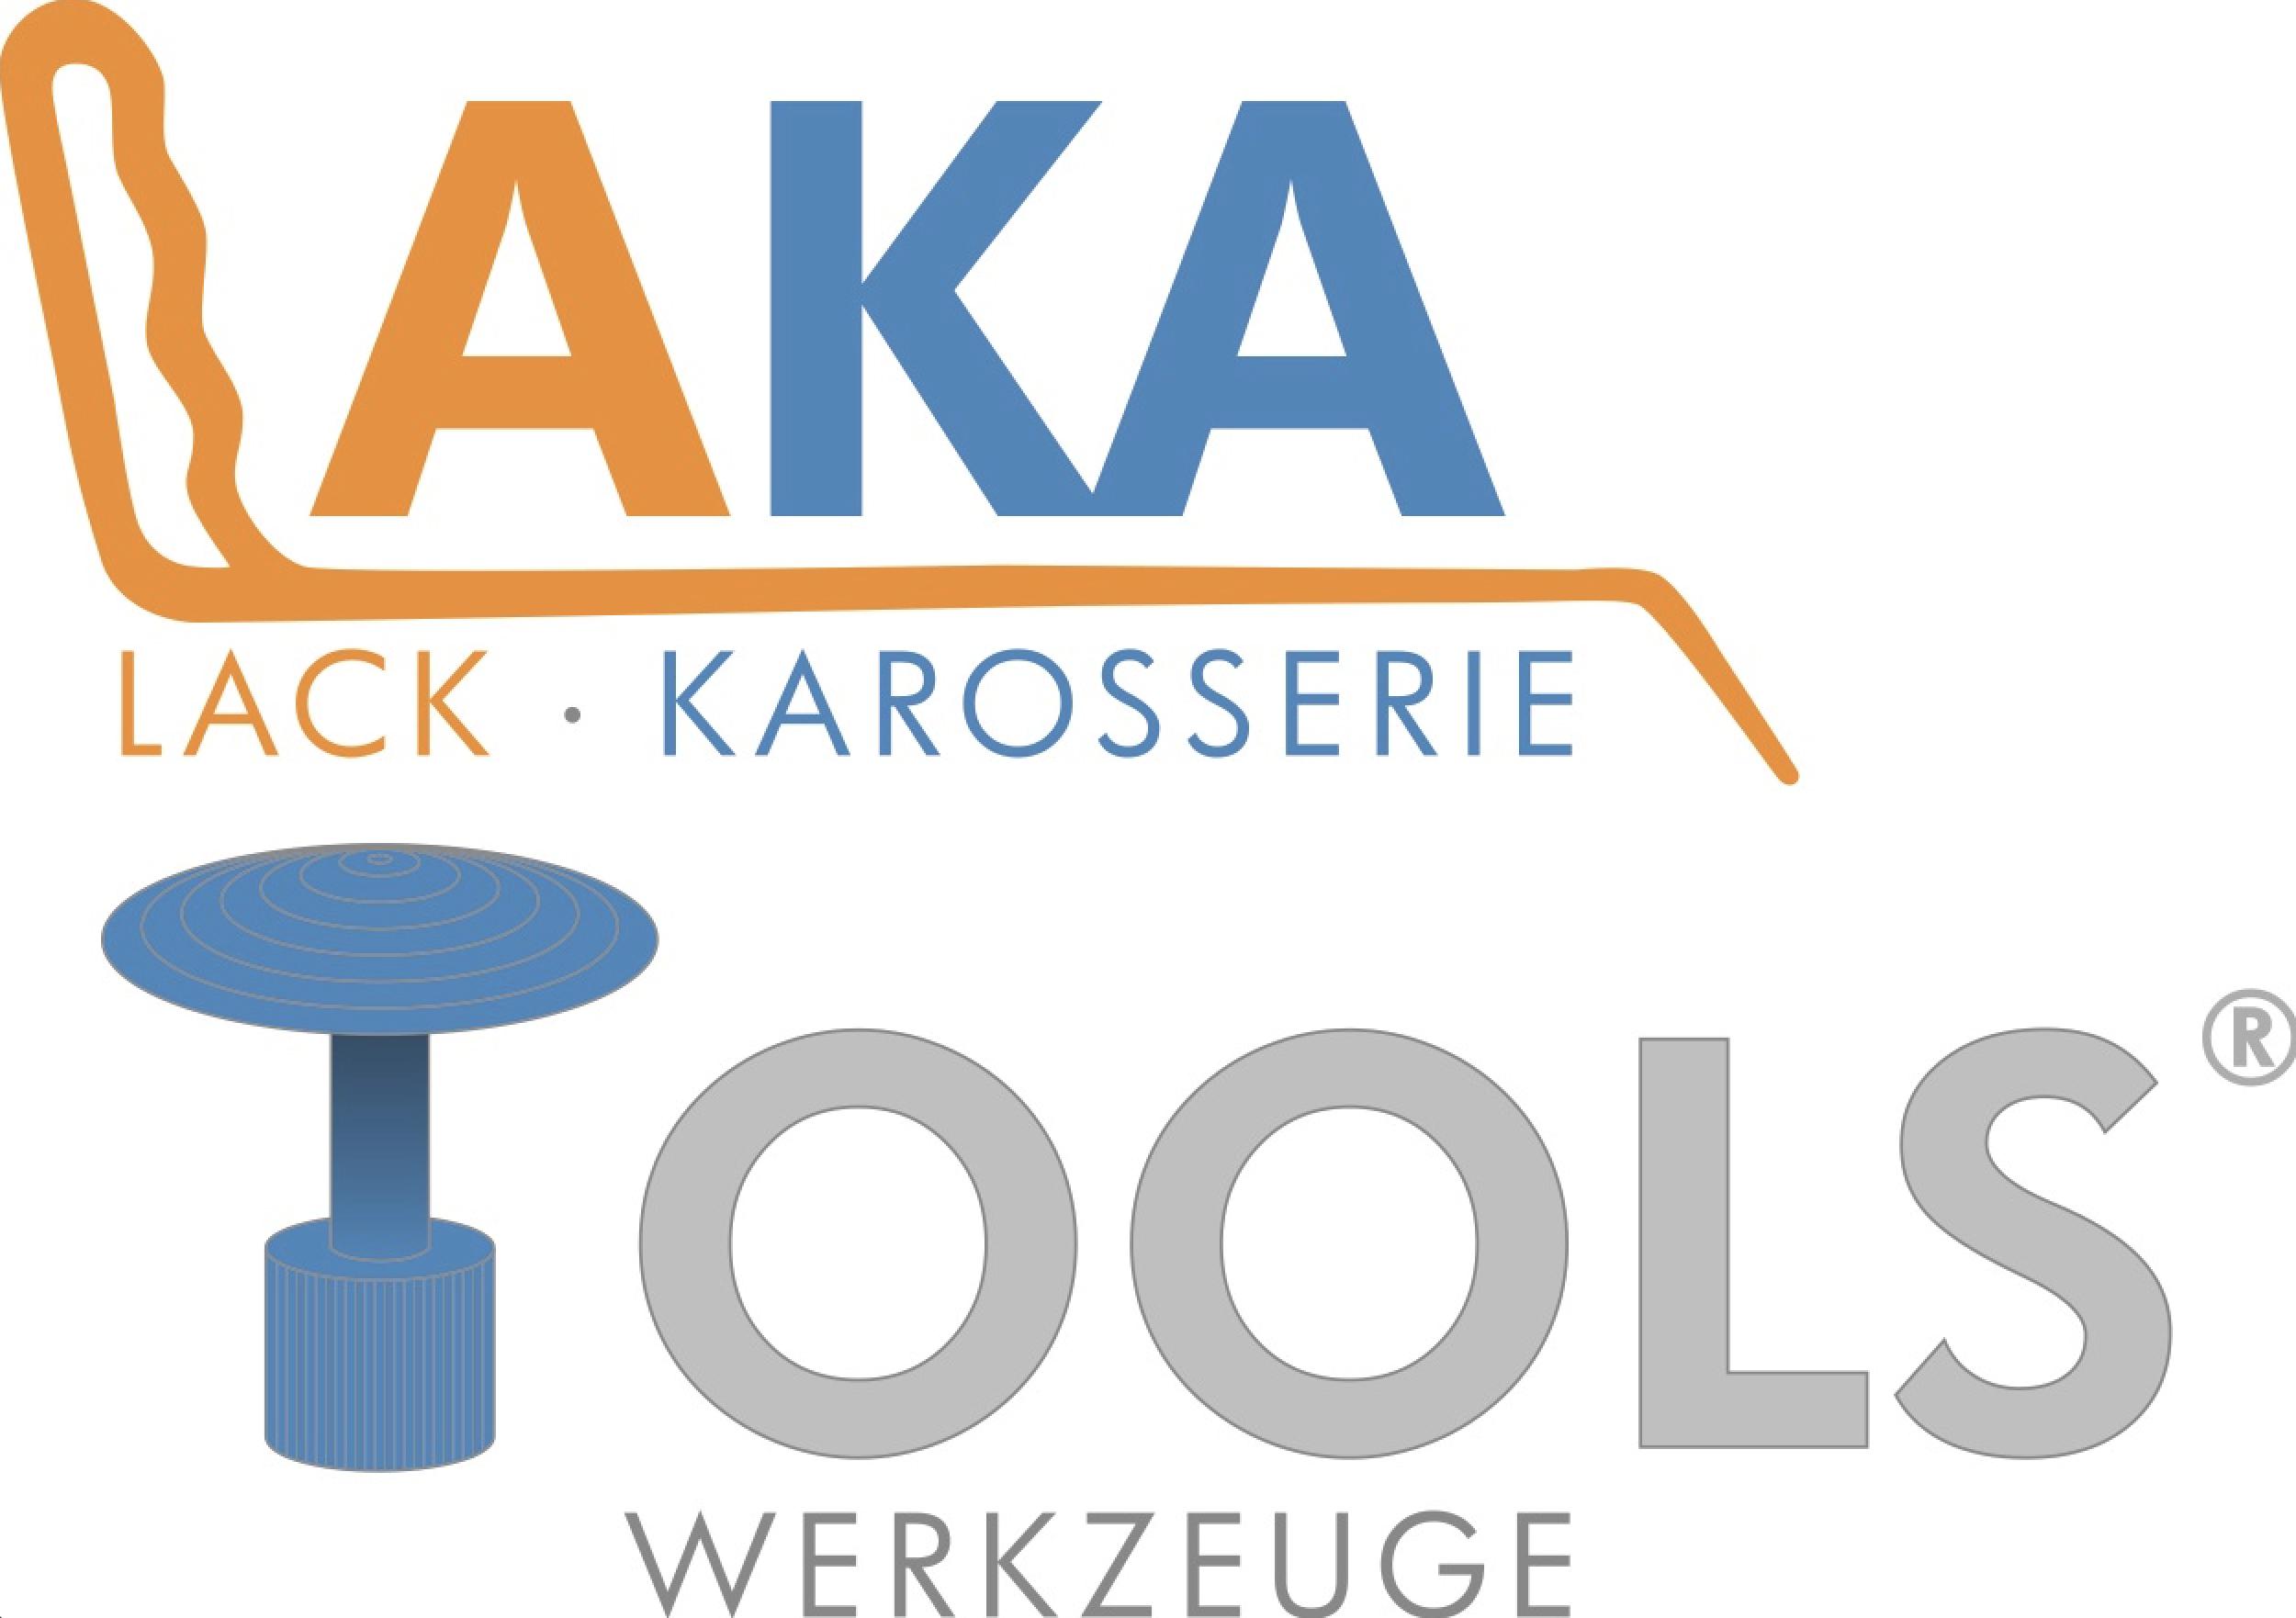 Laka Tools Onlinestore